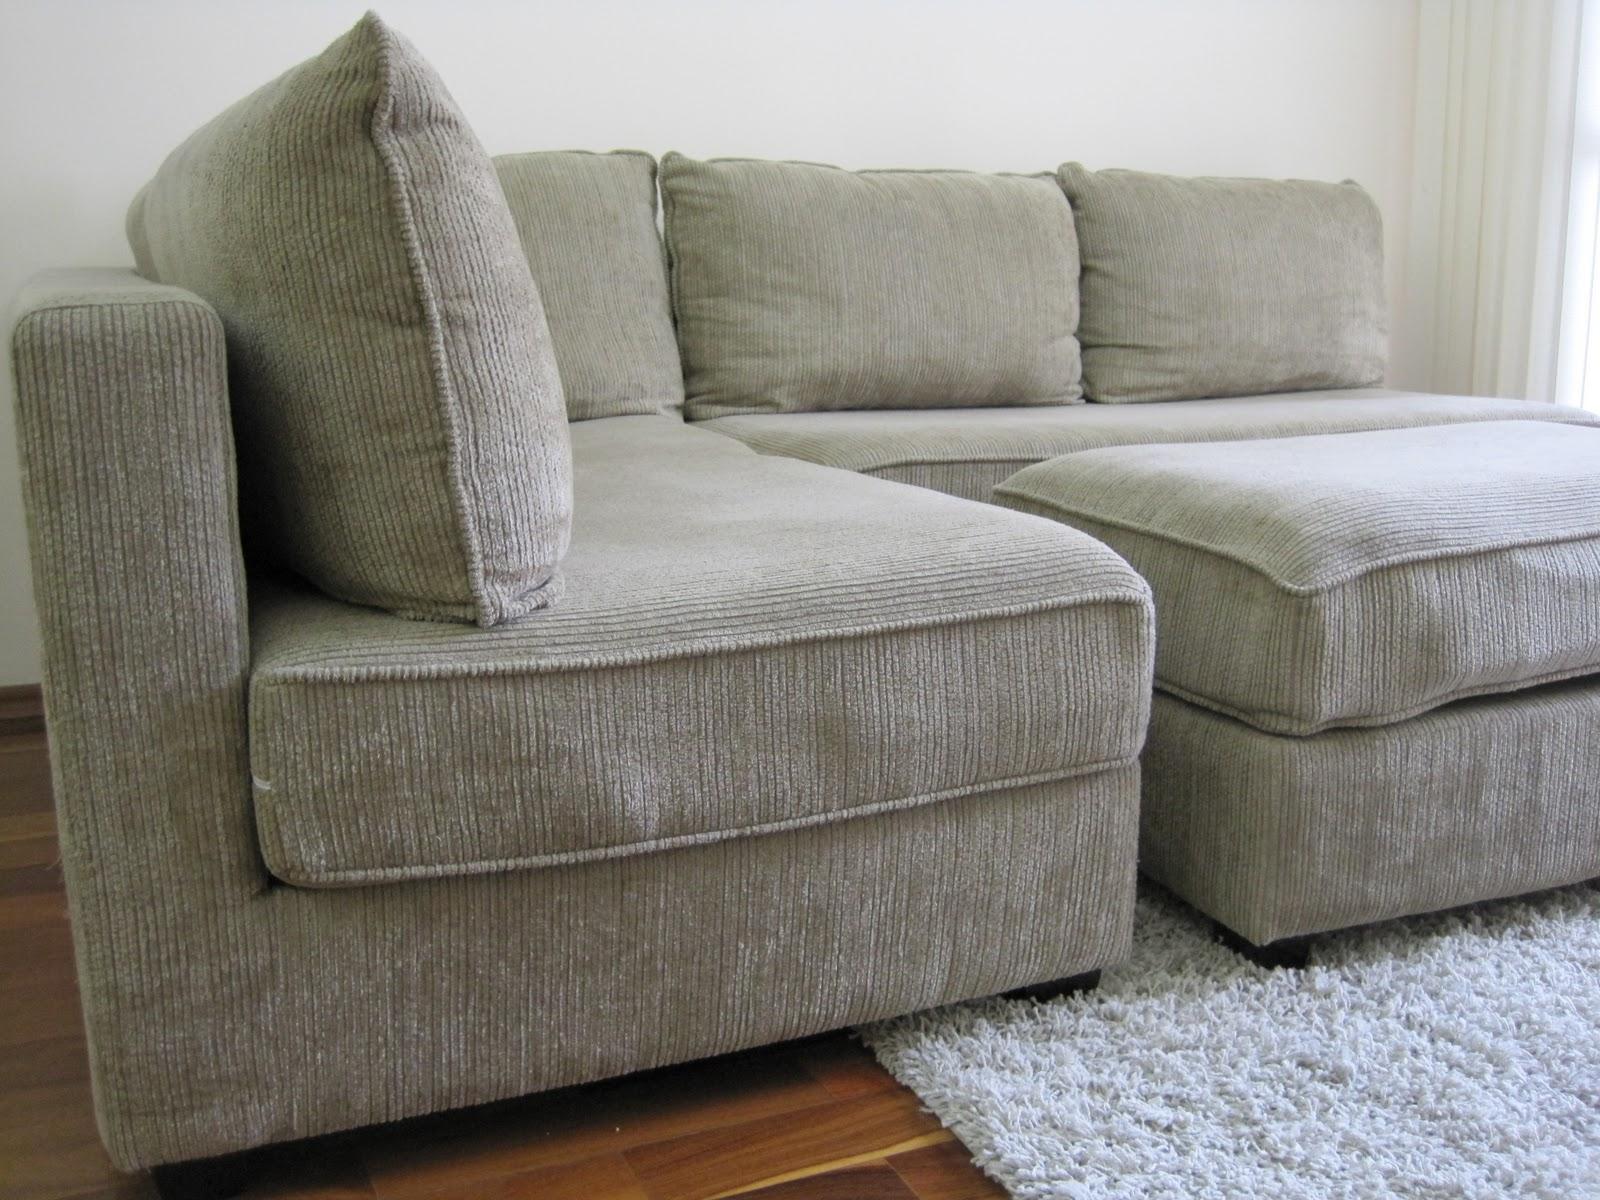 designer sofas on sale laura williams garage sale